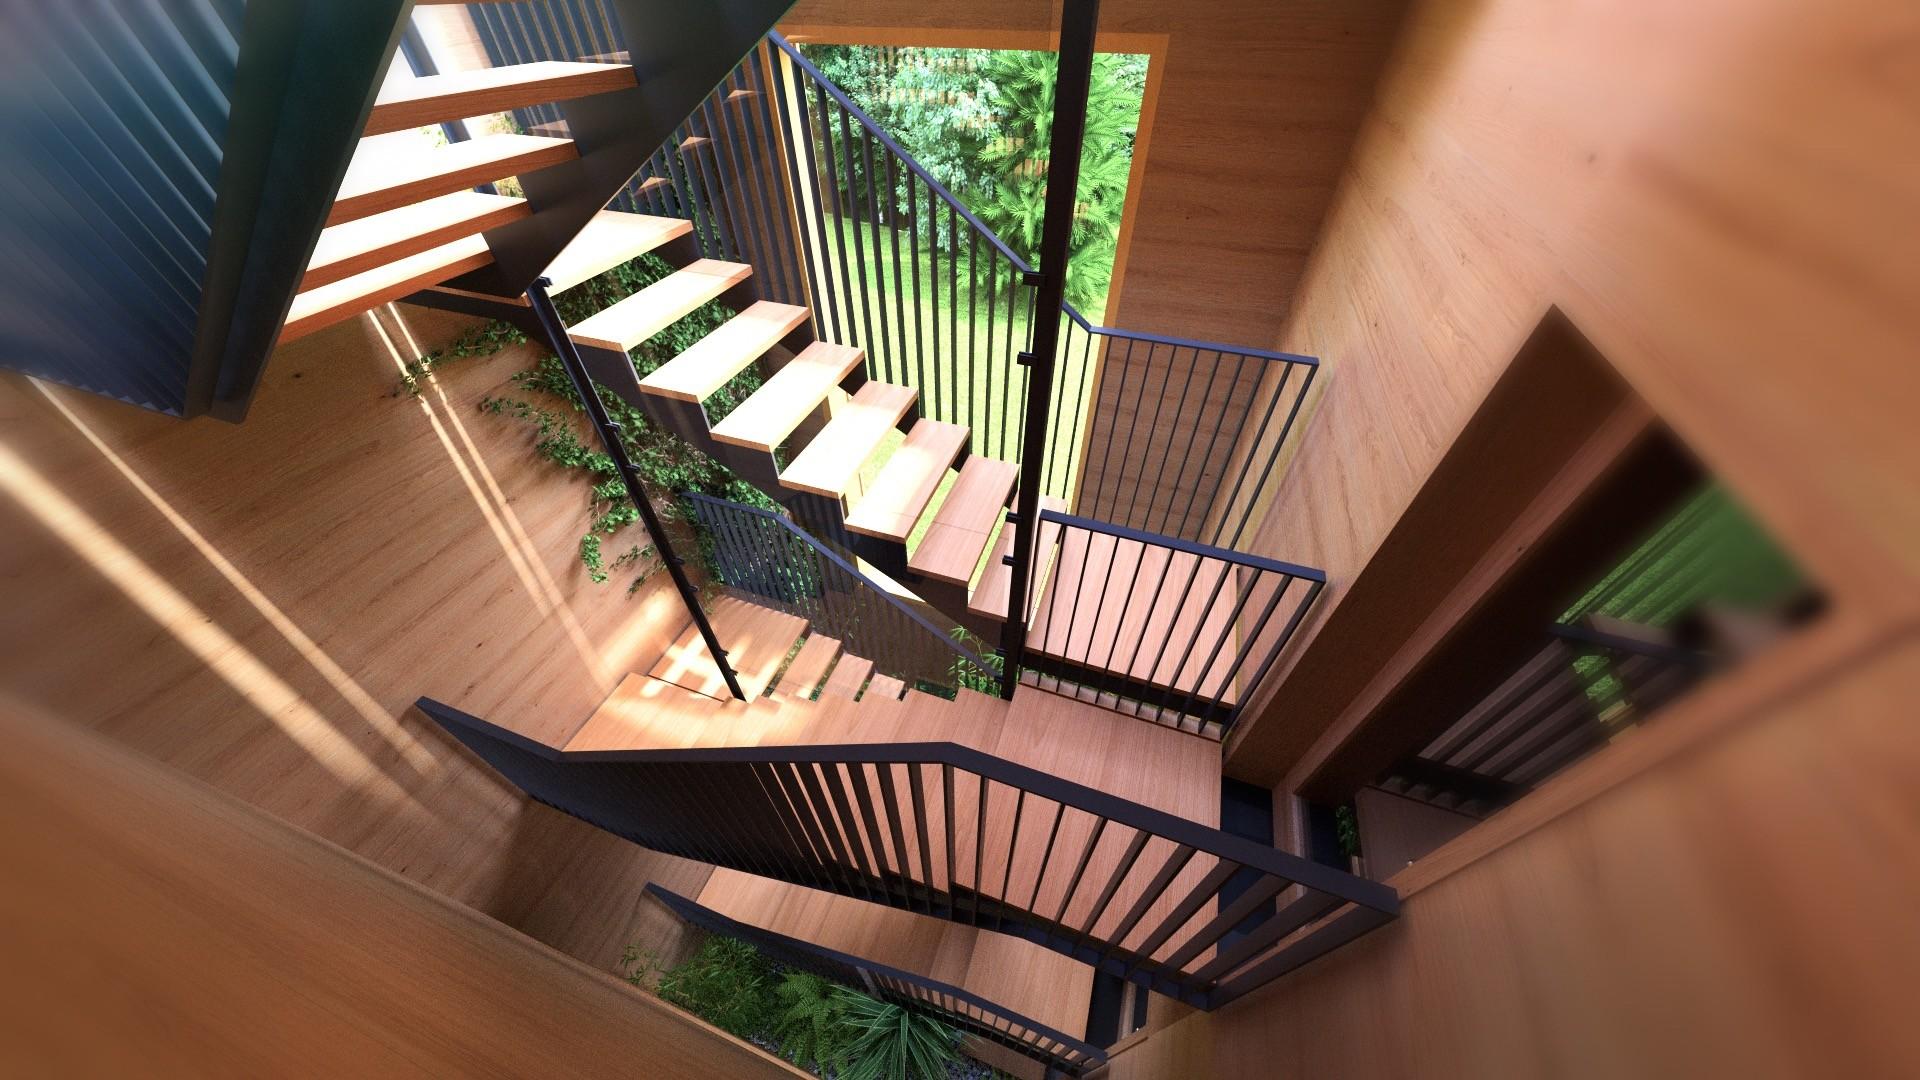 Duane kemp 28b a1309 villas portier 3d staircase garage staircase 2nd floor 01g